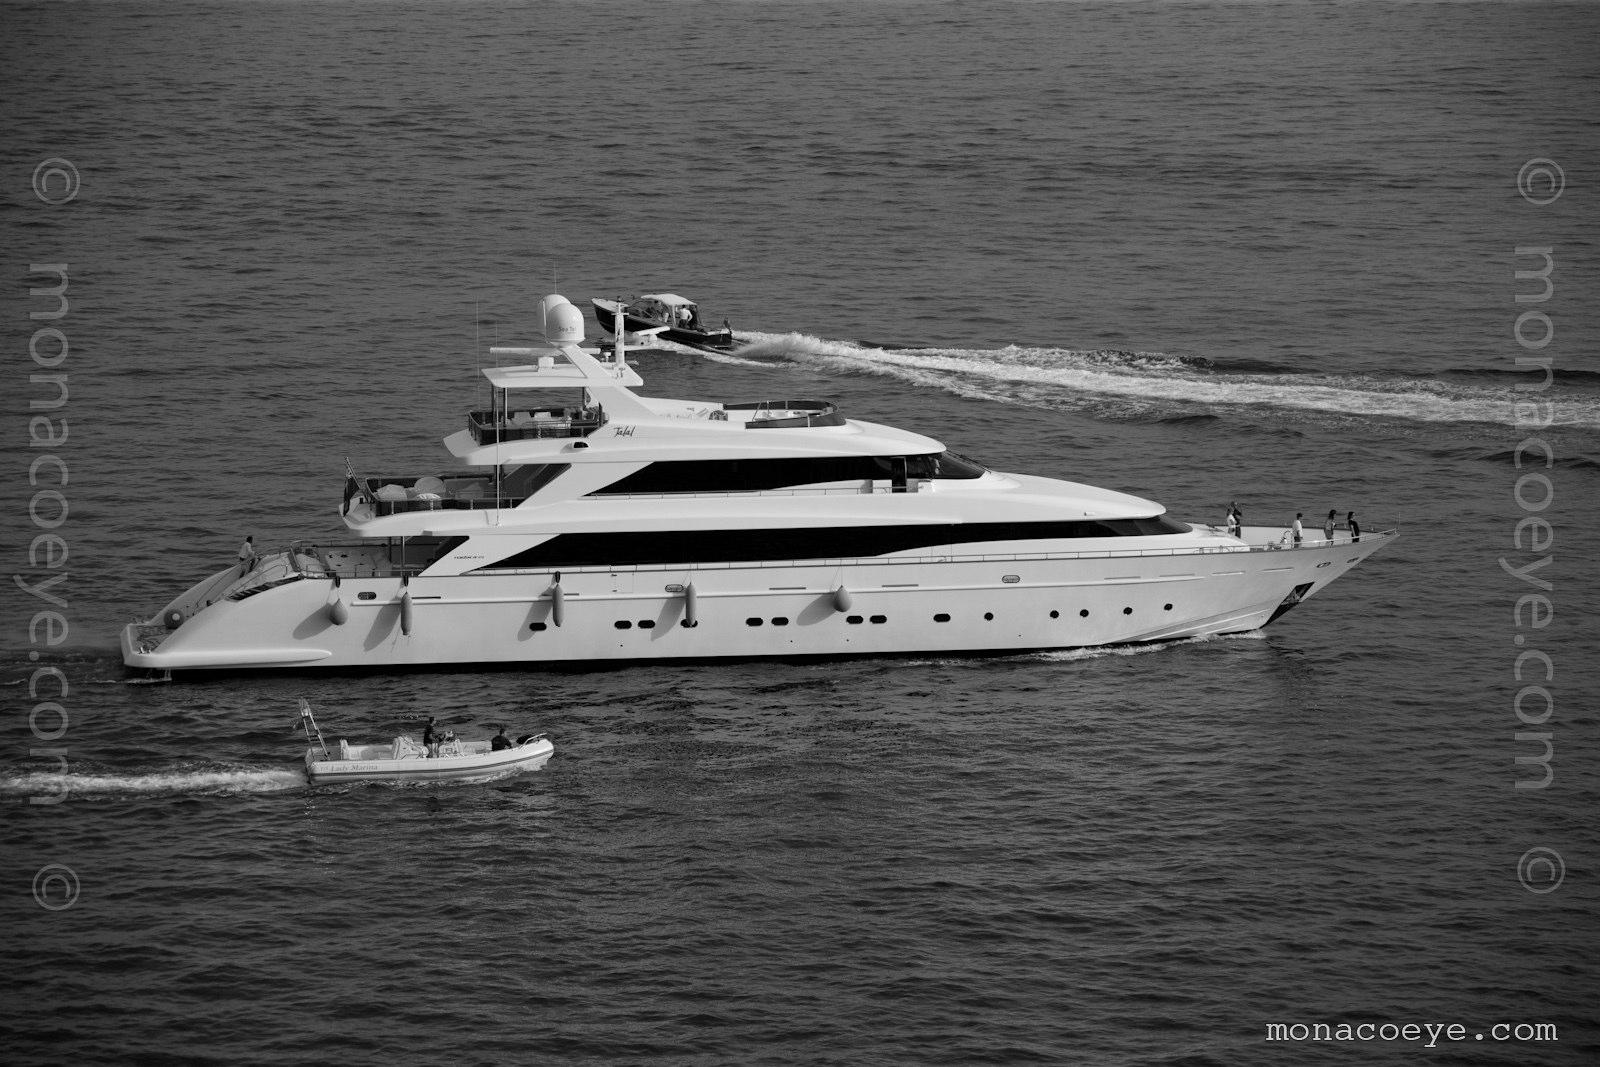 Monaco Yacht Show 2010 - Talal, 45m 2010 motoryacht from Tecnomar. Nadara 45